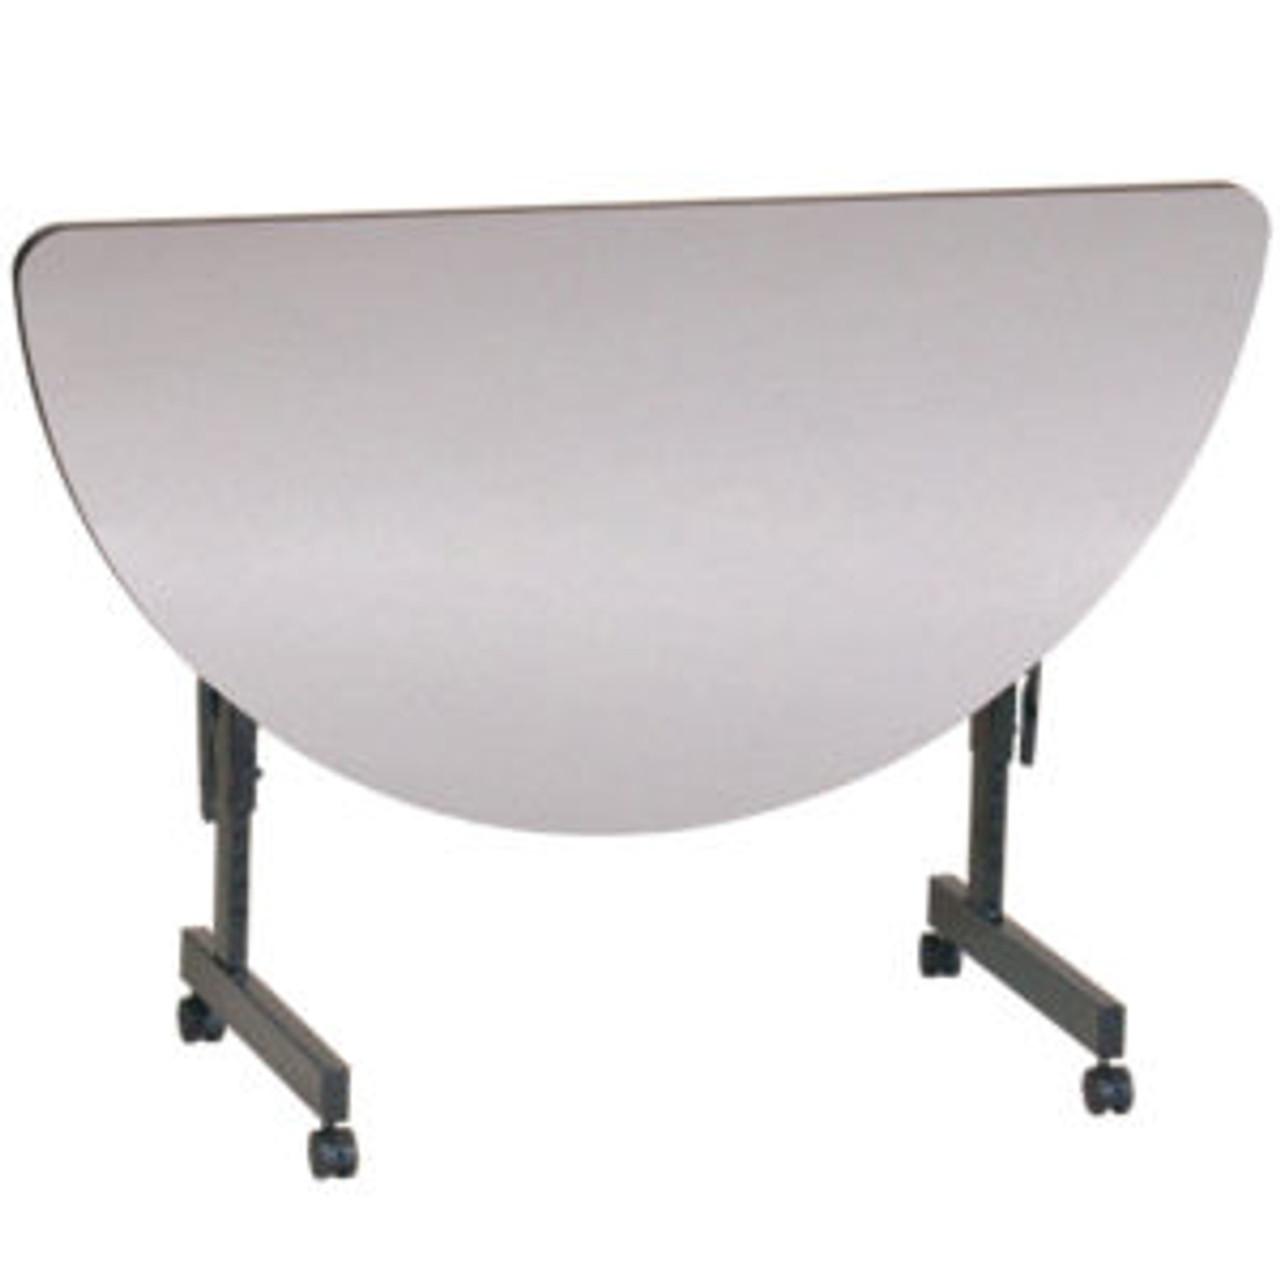 Walnut Melamine Half Round Top 24 x 48 Correll FT2448MR-01 EconoLine Flip Top Table Adjustable Height